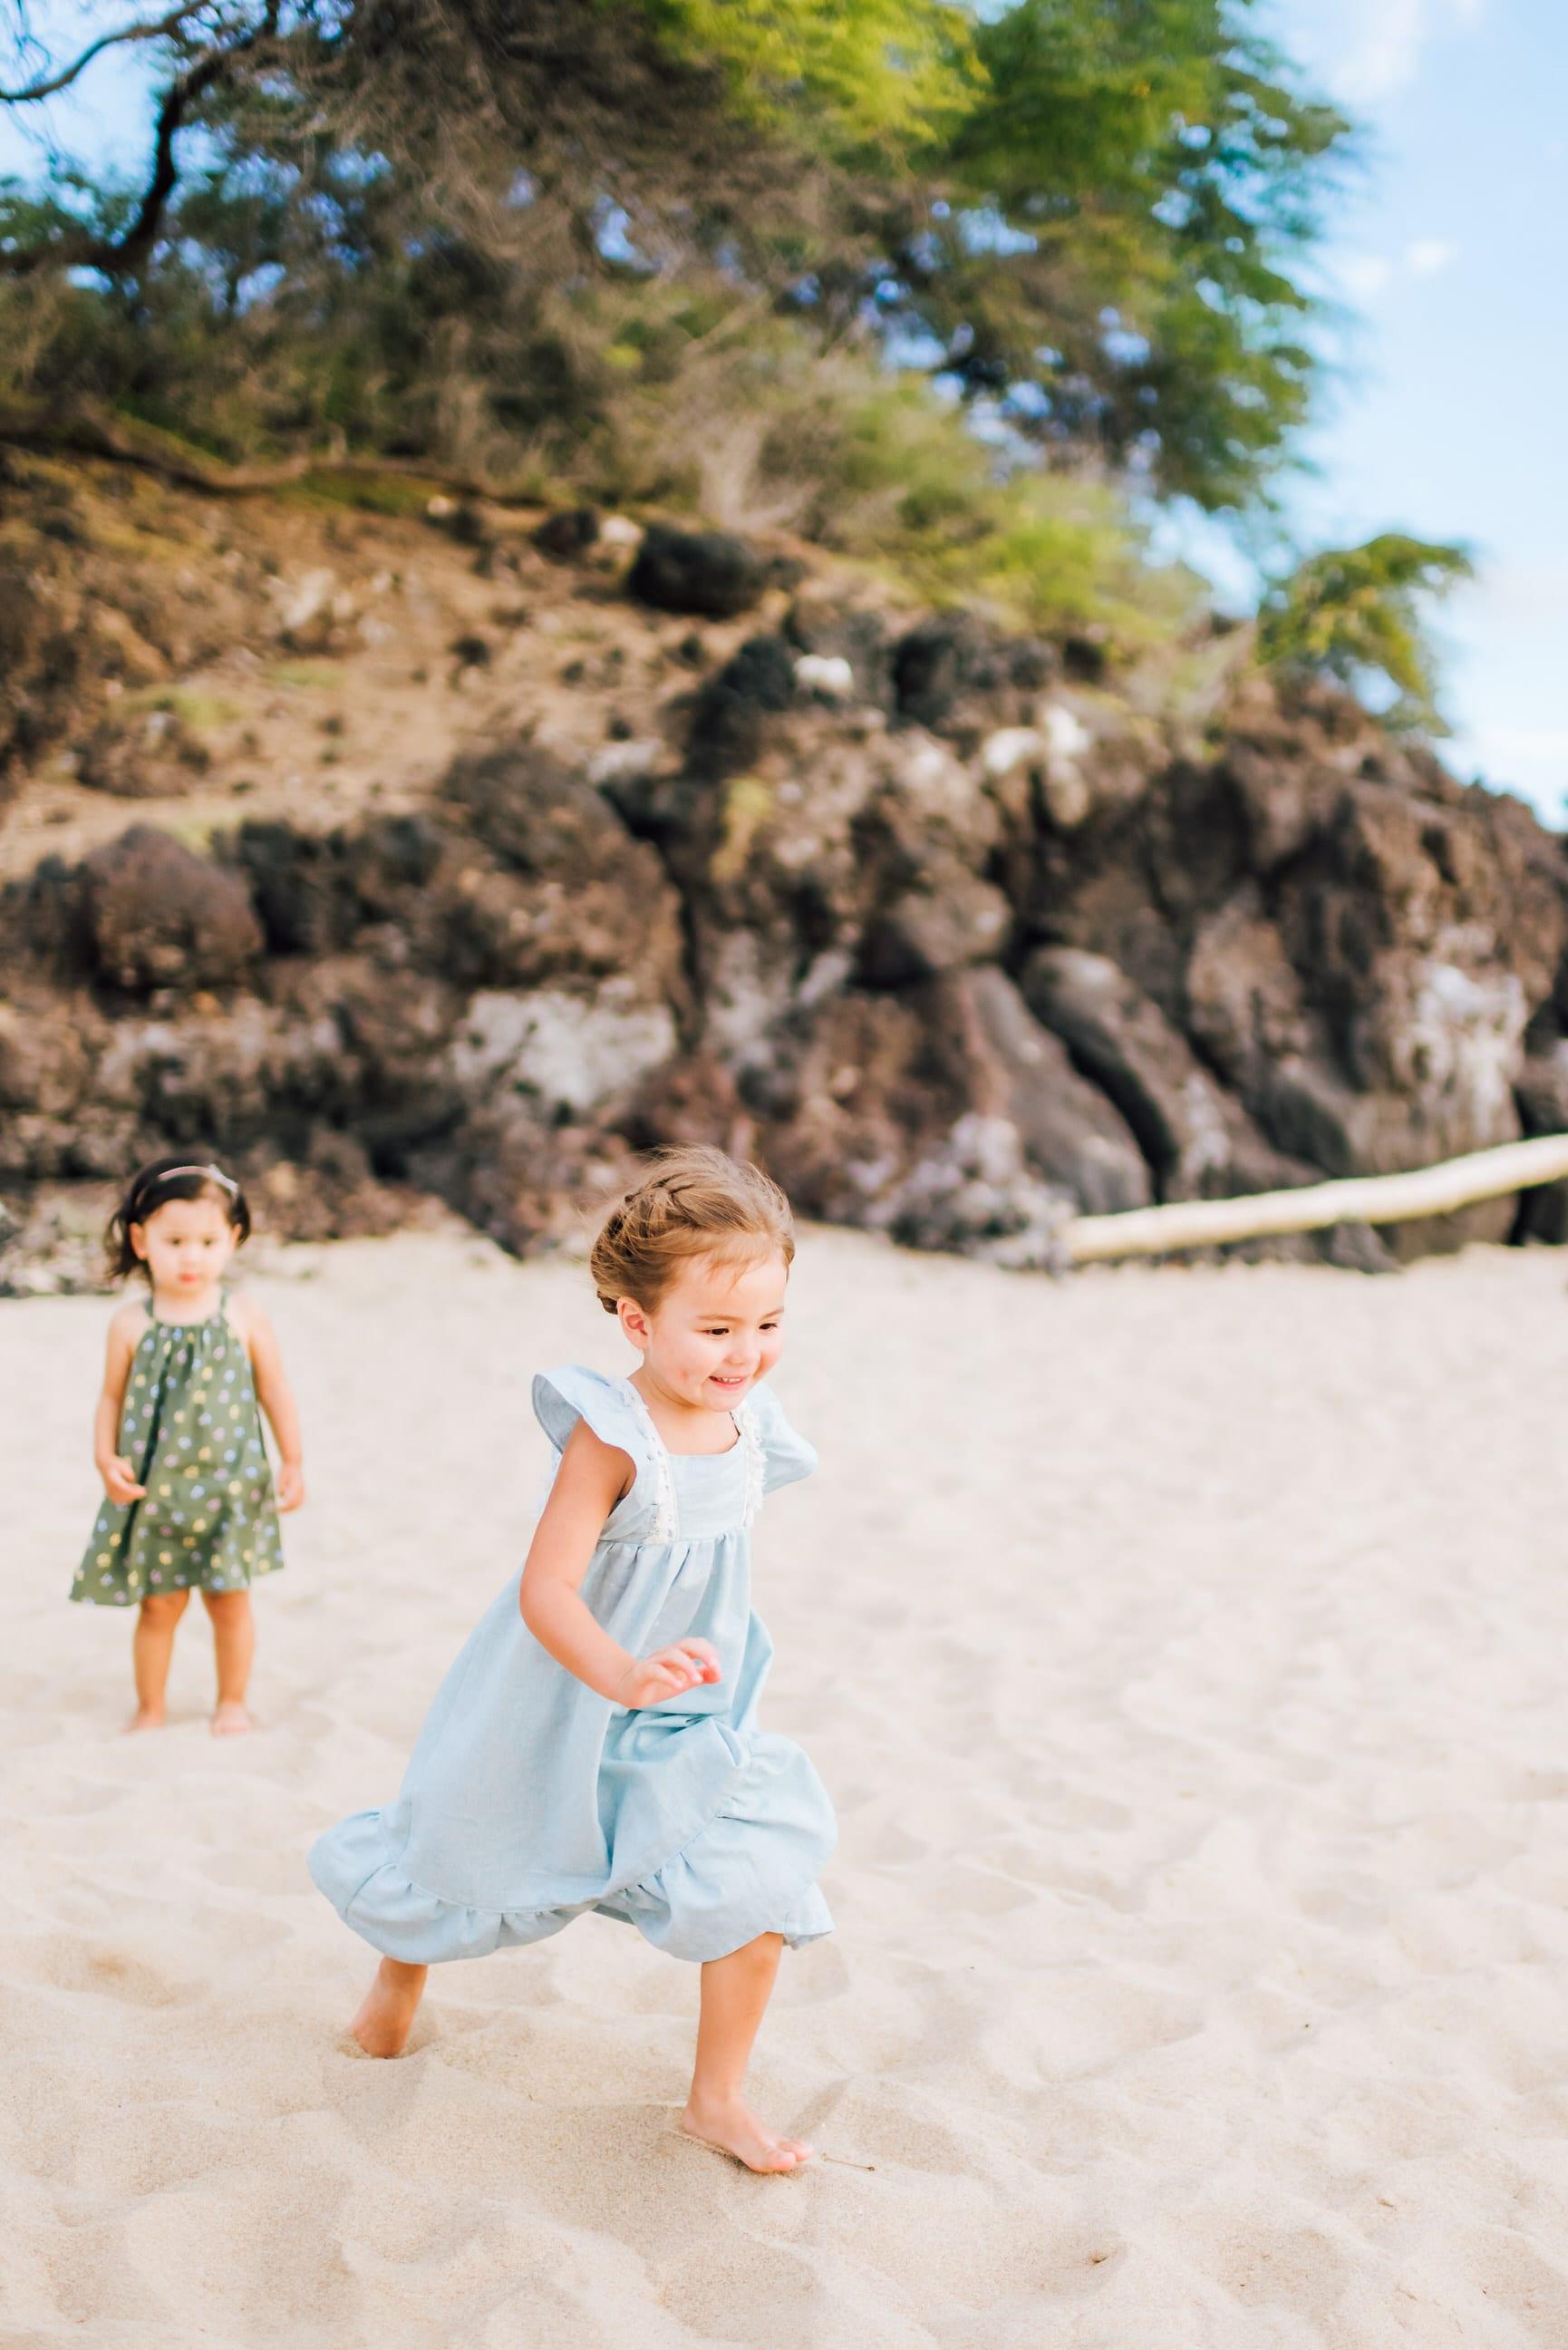 Big-Island-Photographer-Family-2.jpg